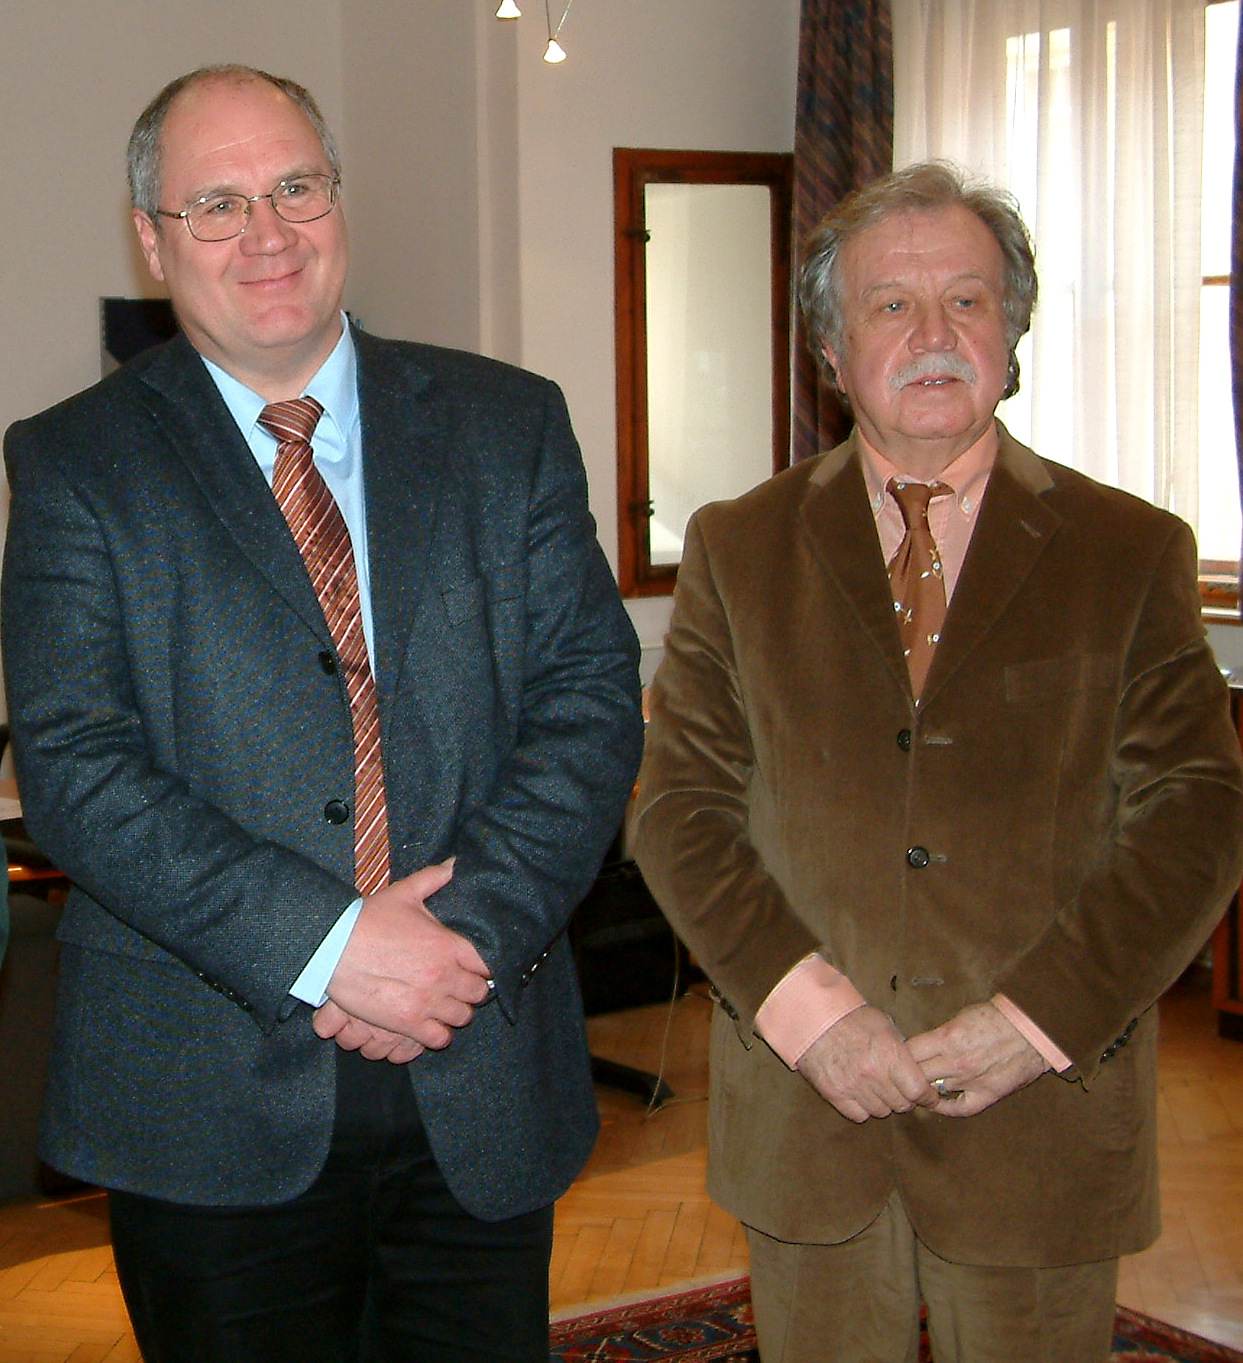 ernest-kalteneger-predsednik-kp-austrije-i-austrijski-parlamentarac